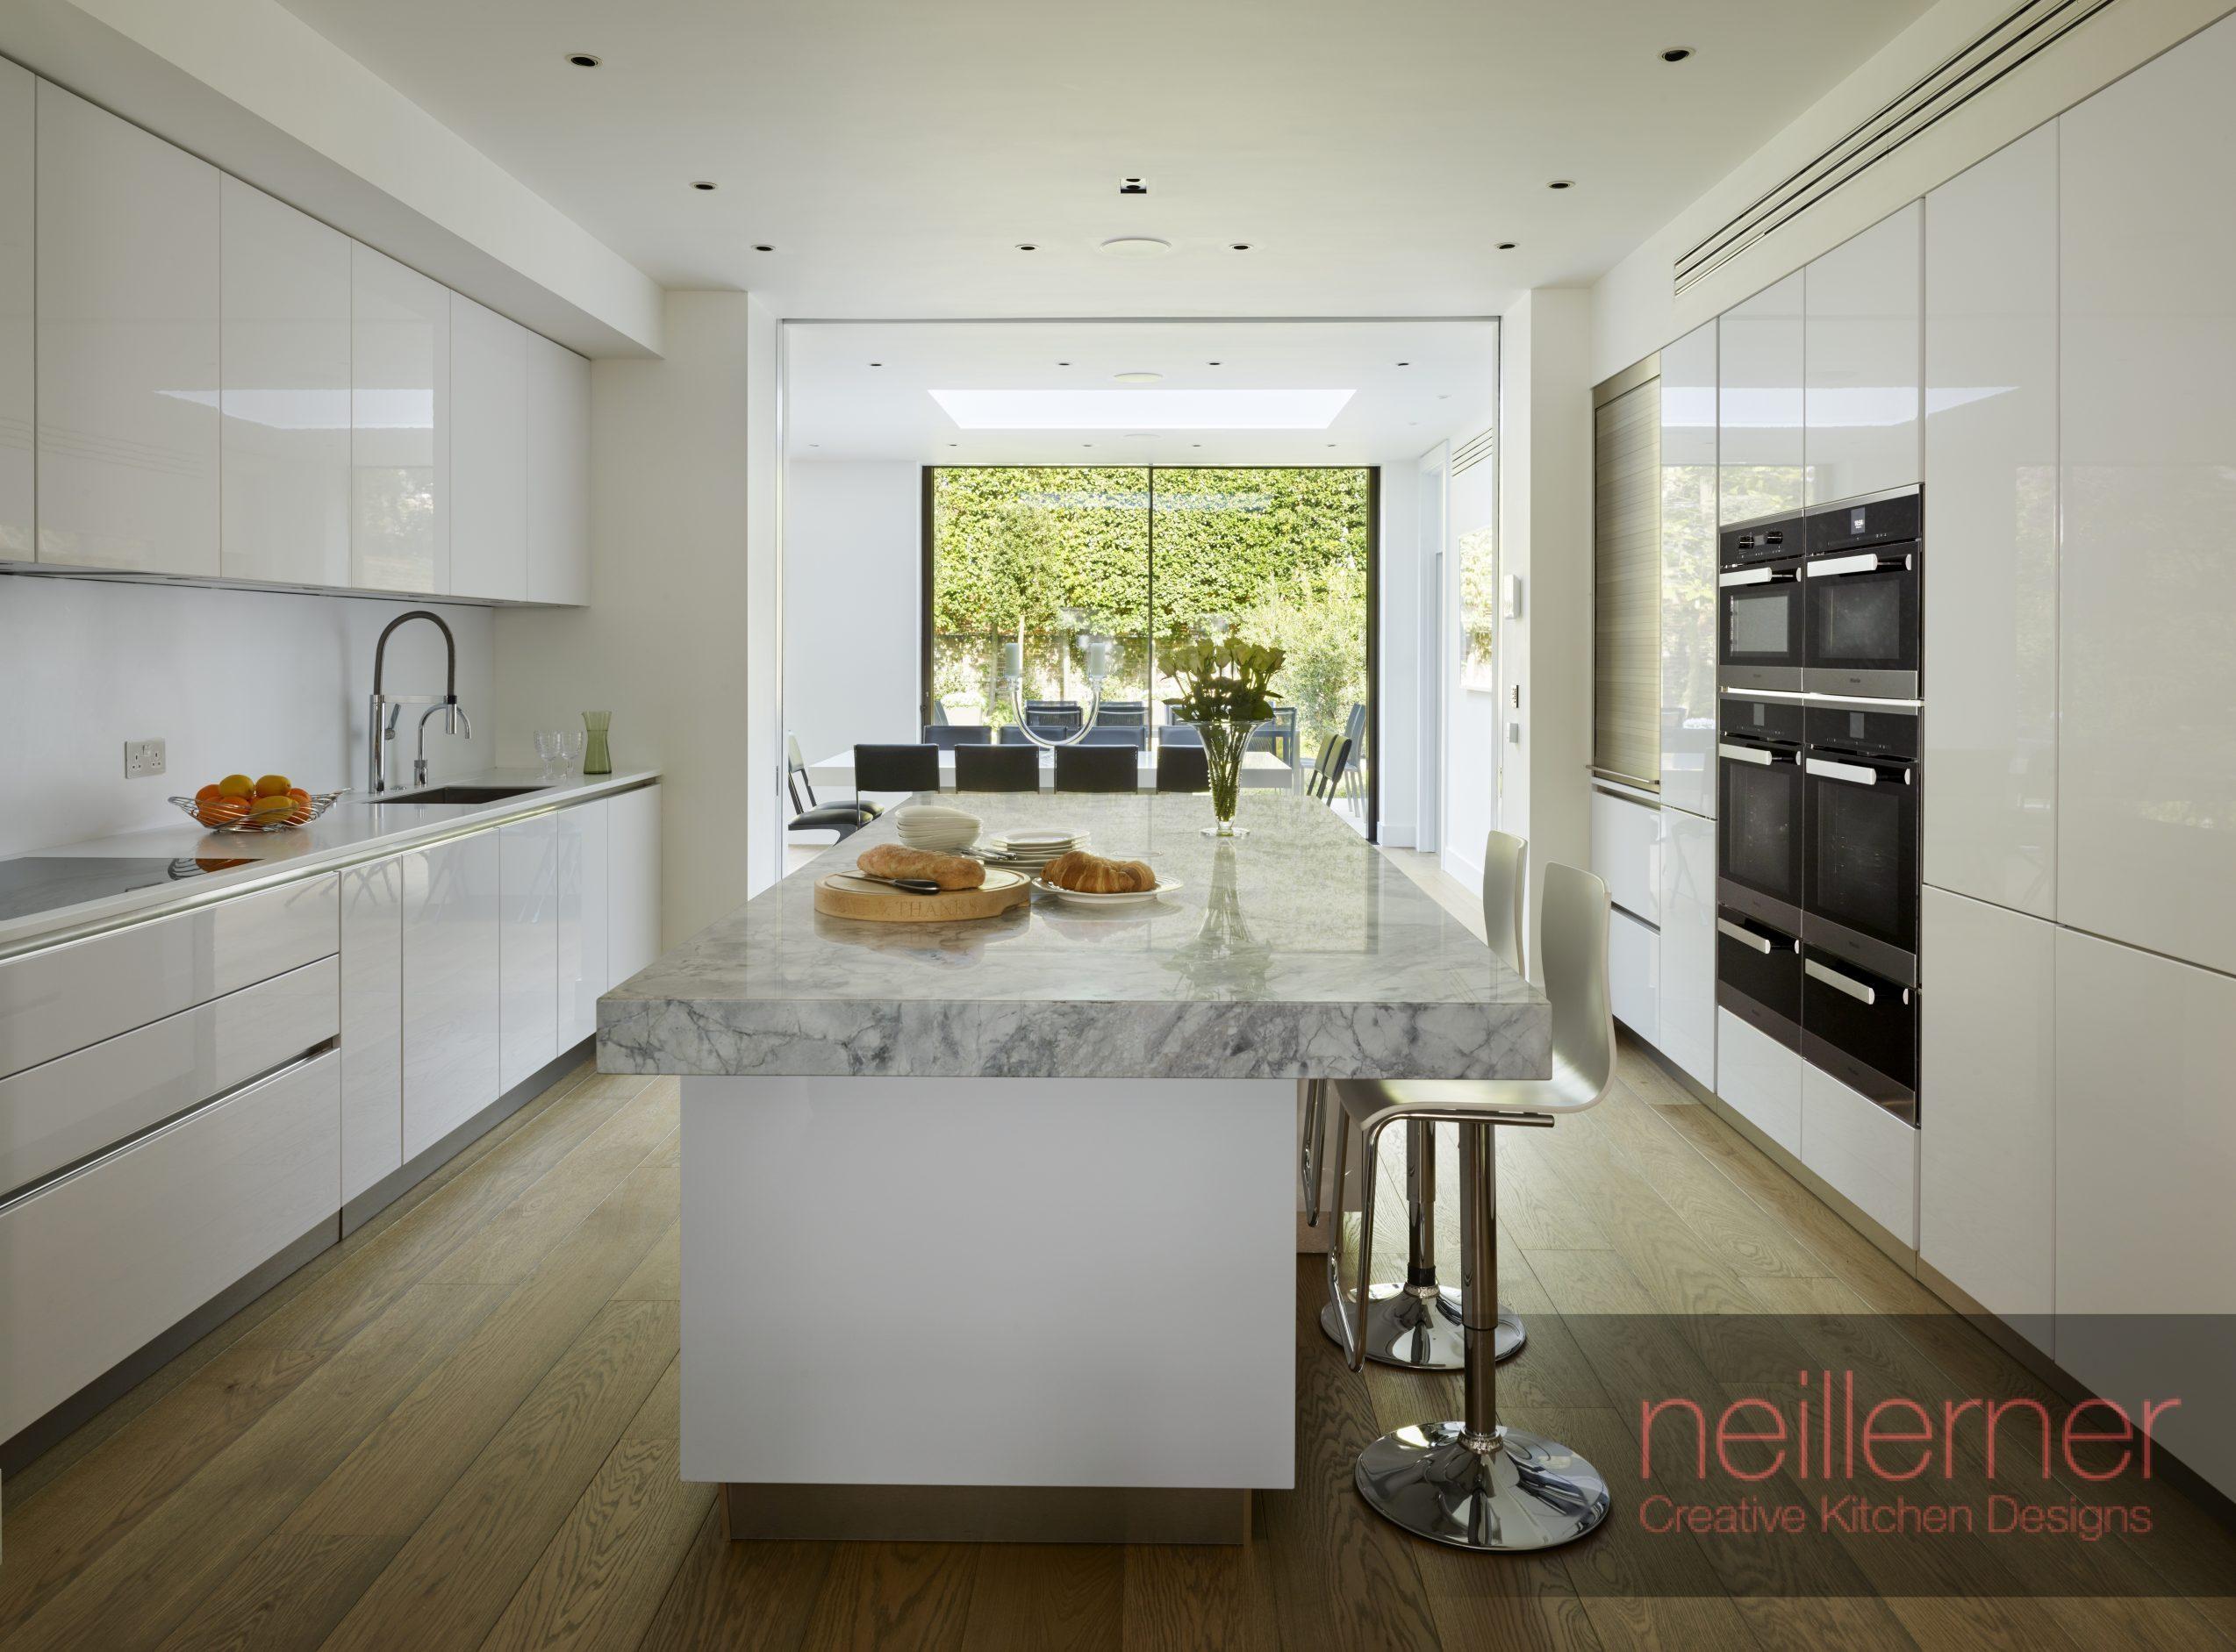 Recent kitchens by neillerner neil lerner designs for Kitchen ideas st johns woking